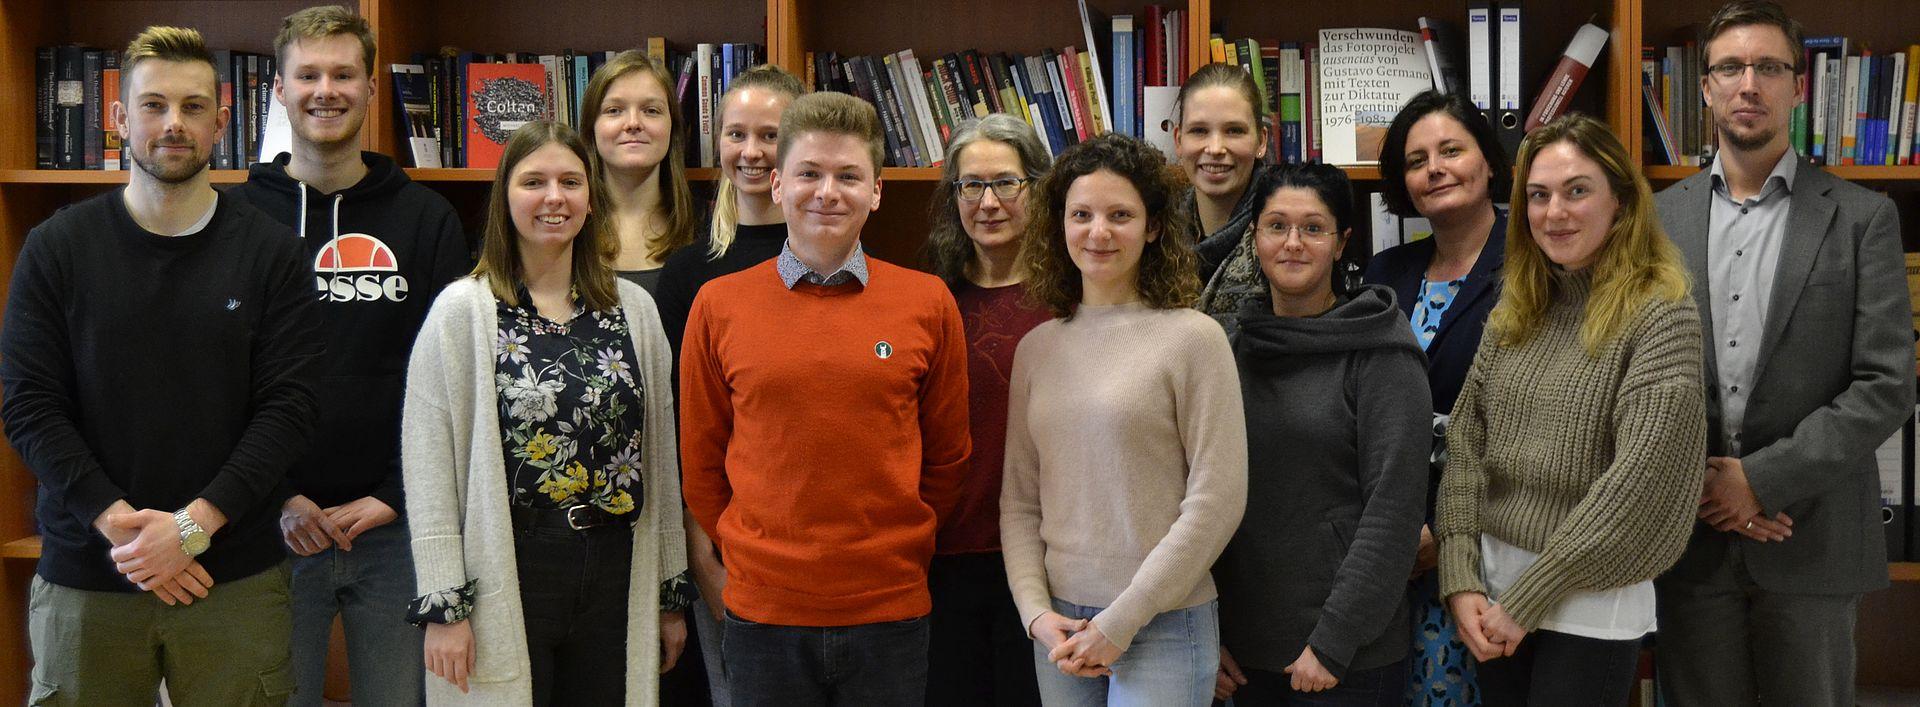 Teamfoto IB Lehrstuhl Feb 2020